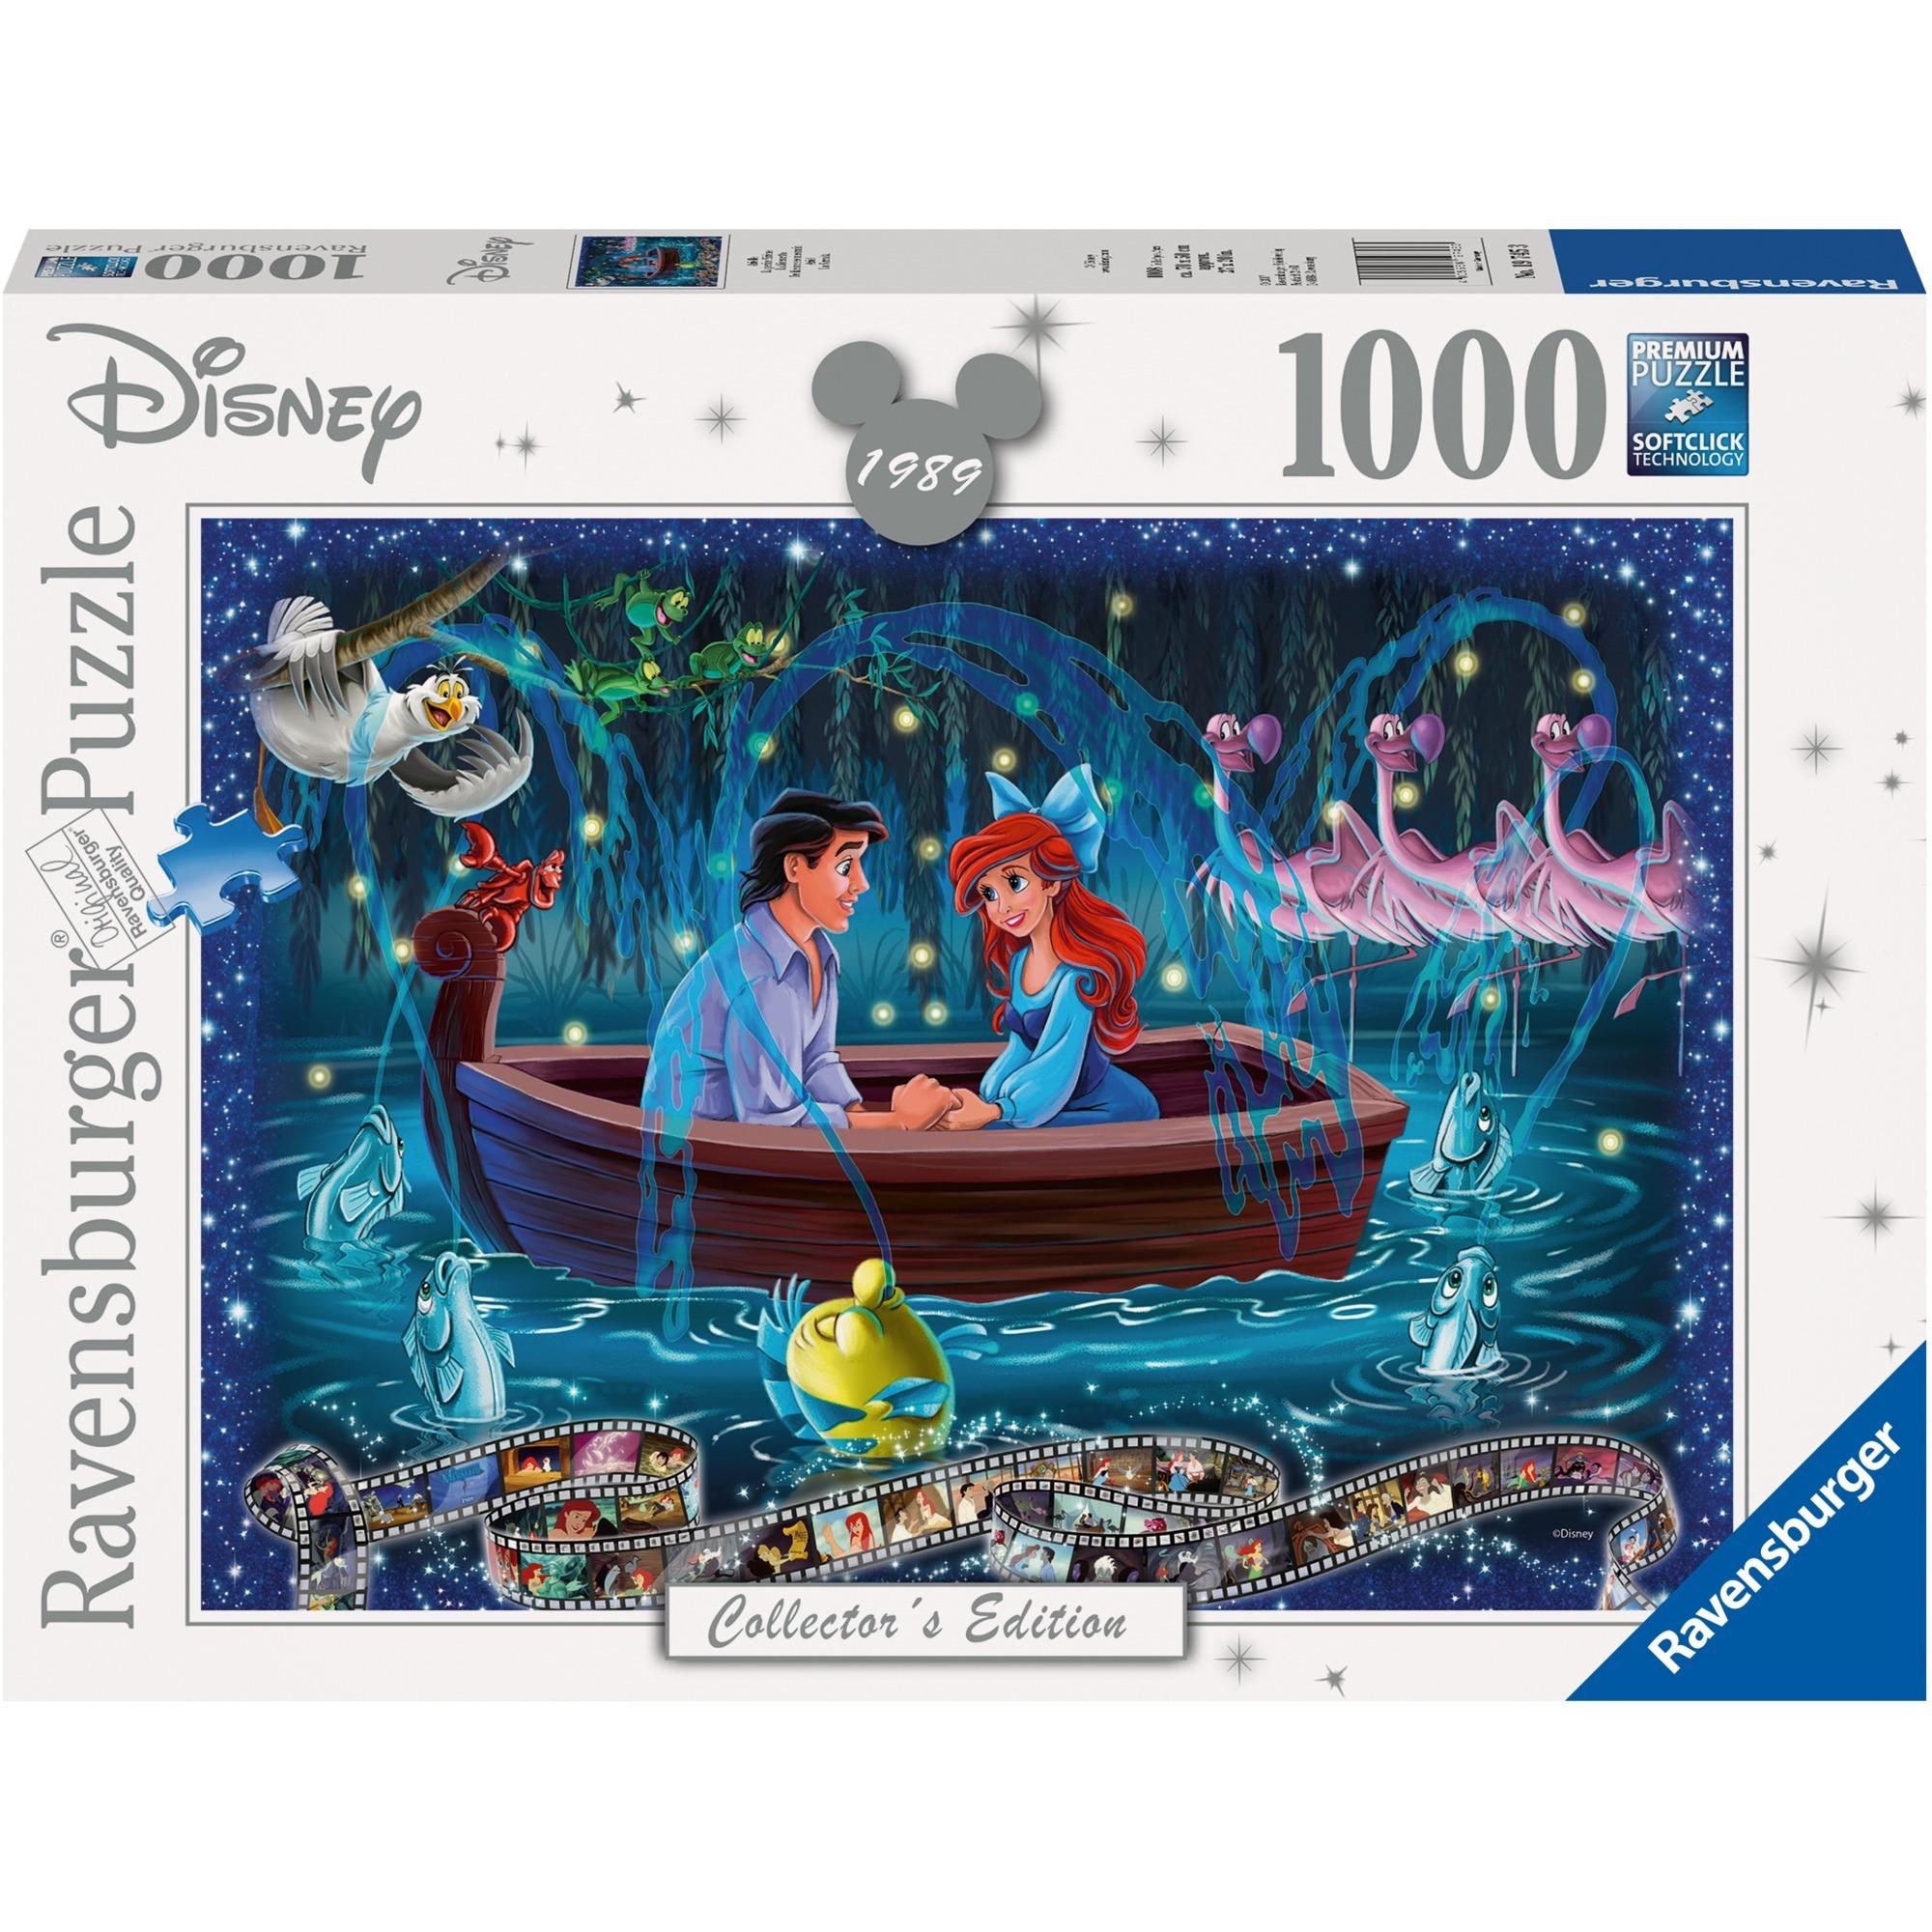 00.019.745 puzzle Puzzle rompecabezas 1000 pieza(s)